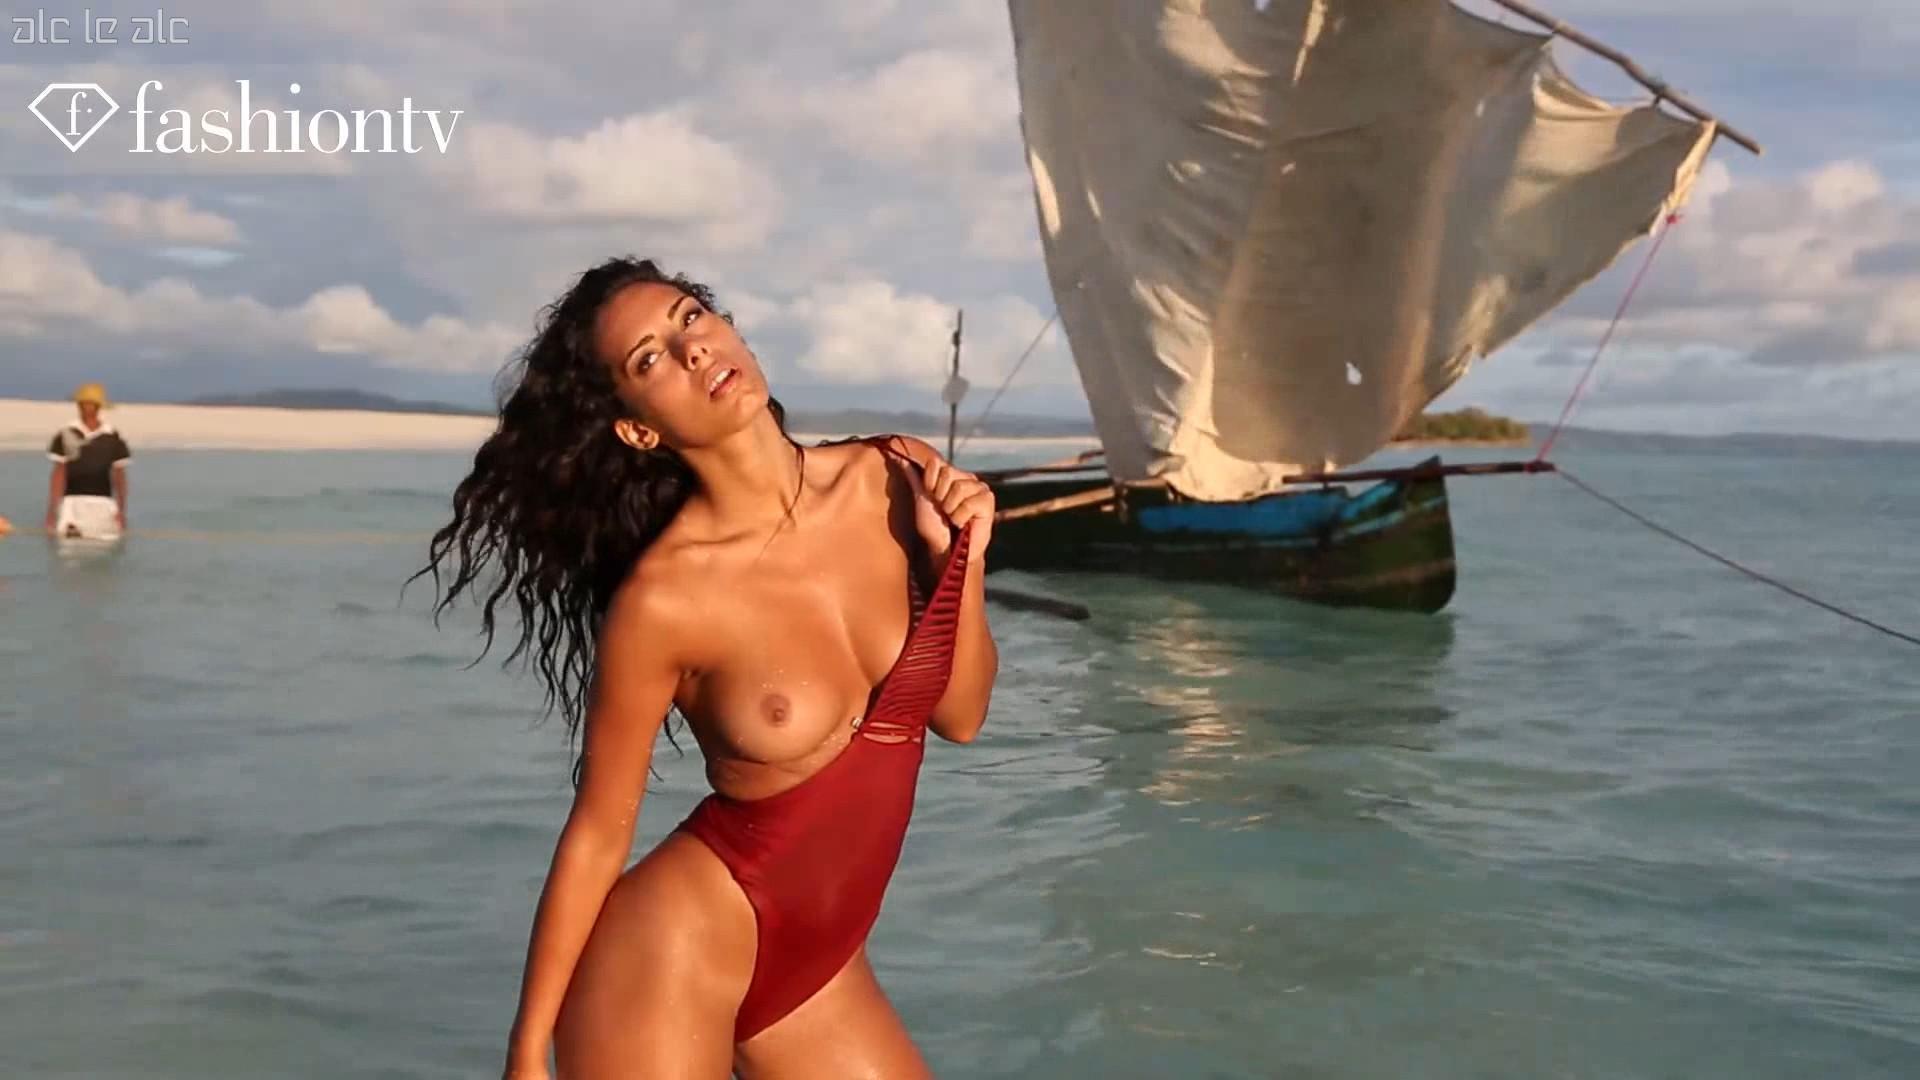 Watch Raffaella modugno topless 7 Photos video